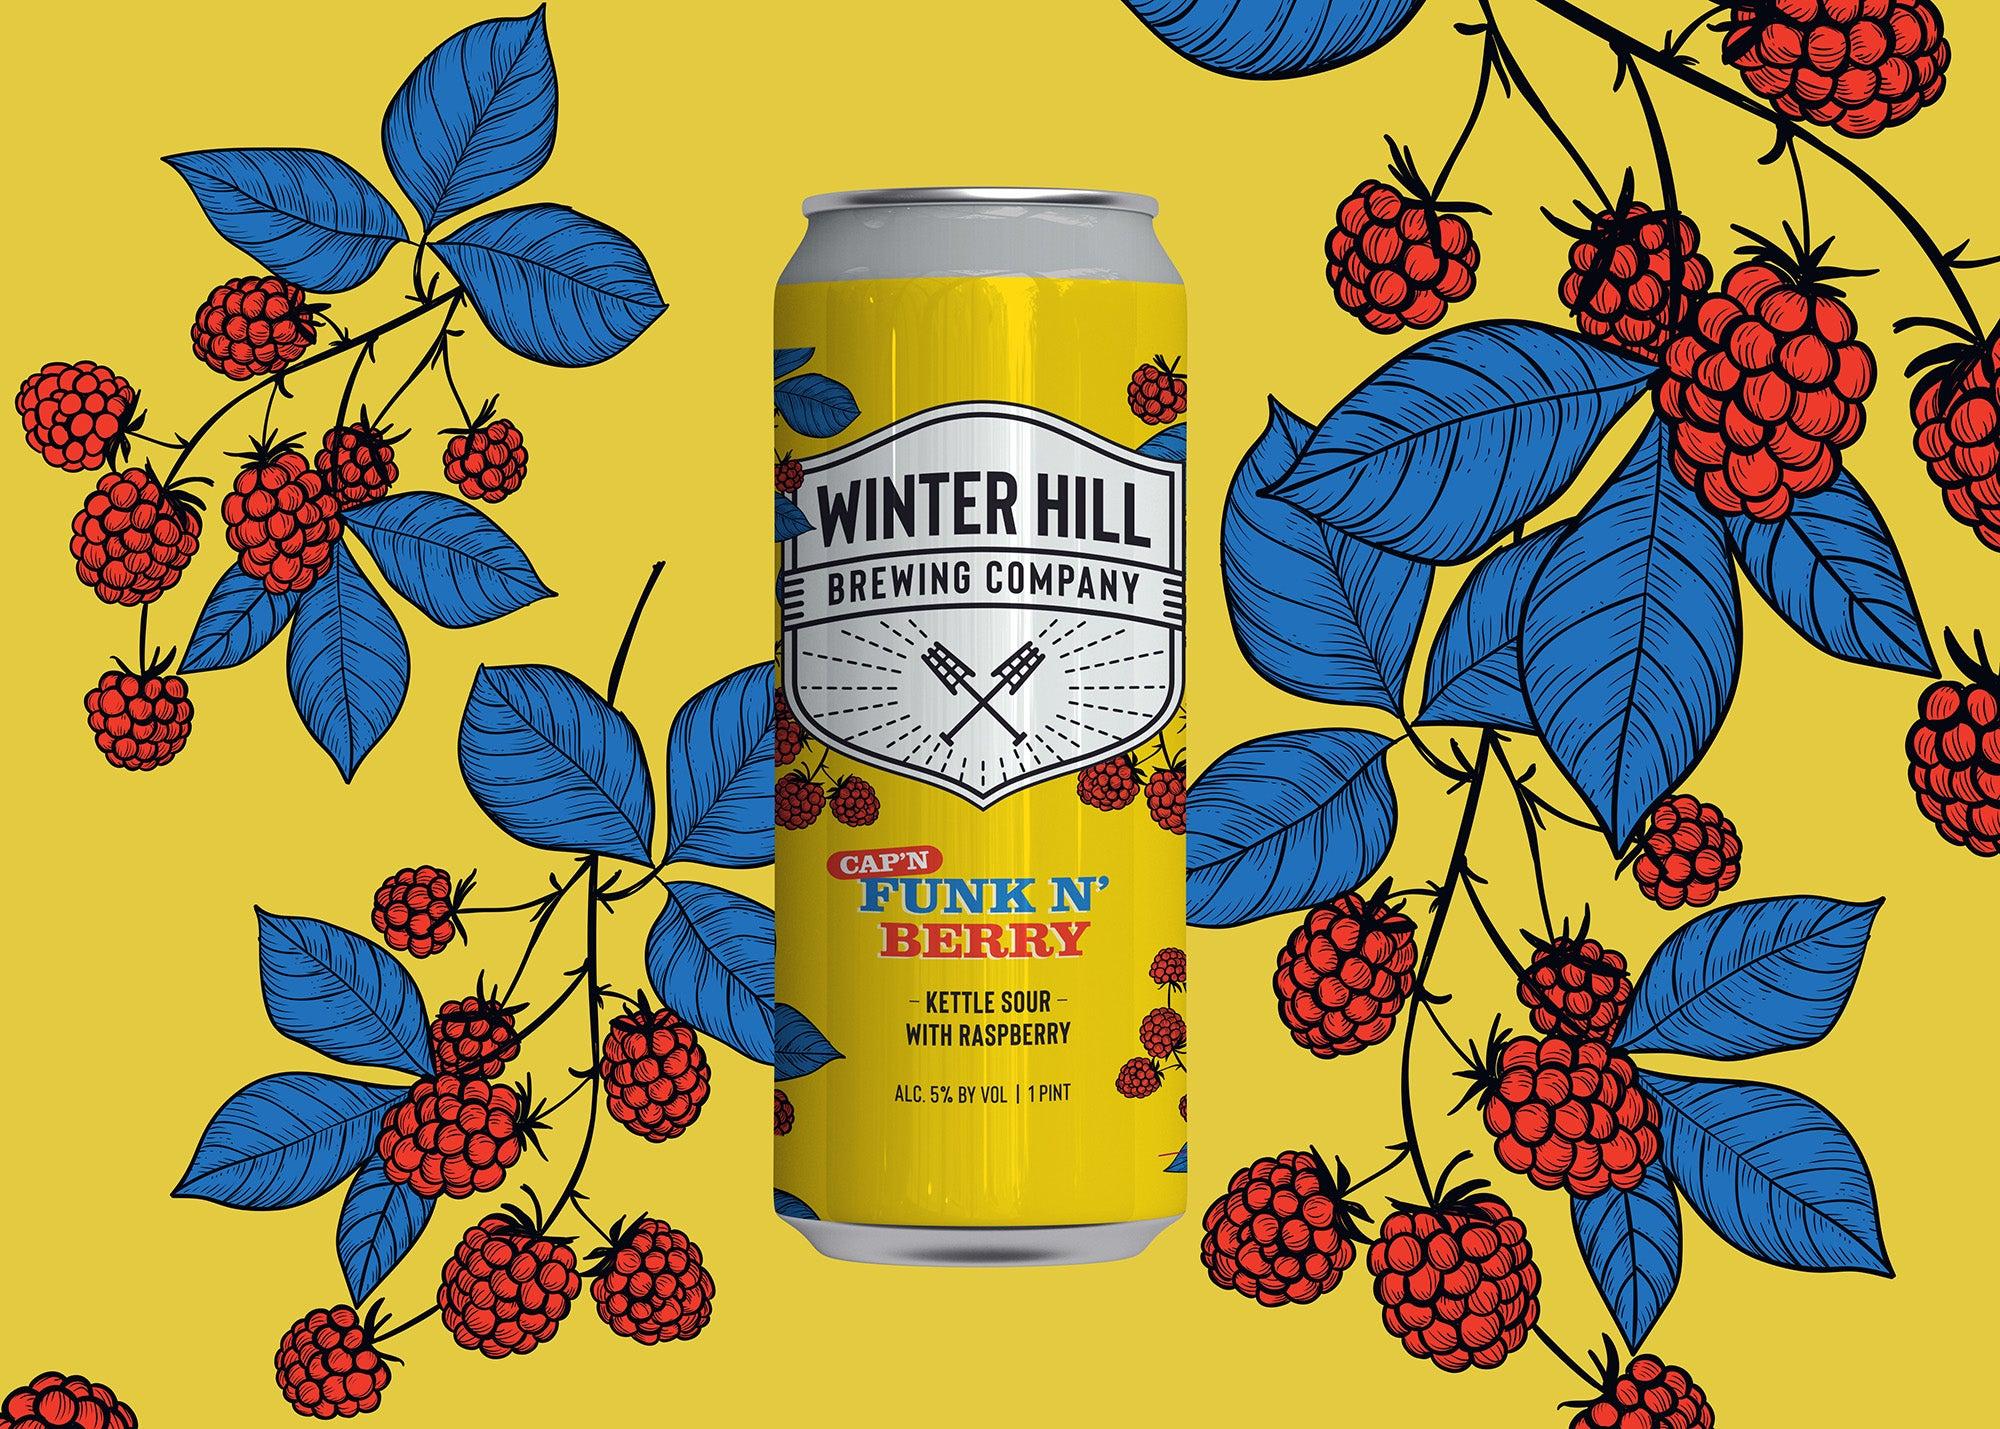 Cap'n Funk 'n' Berry at Winter Hill Brewing